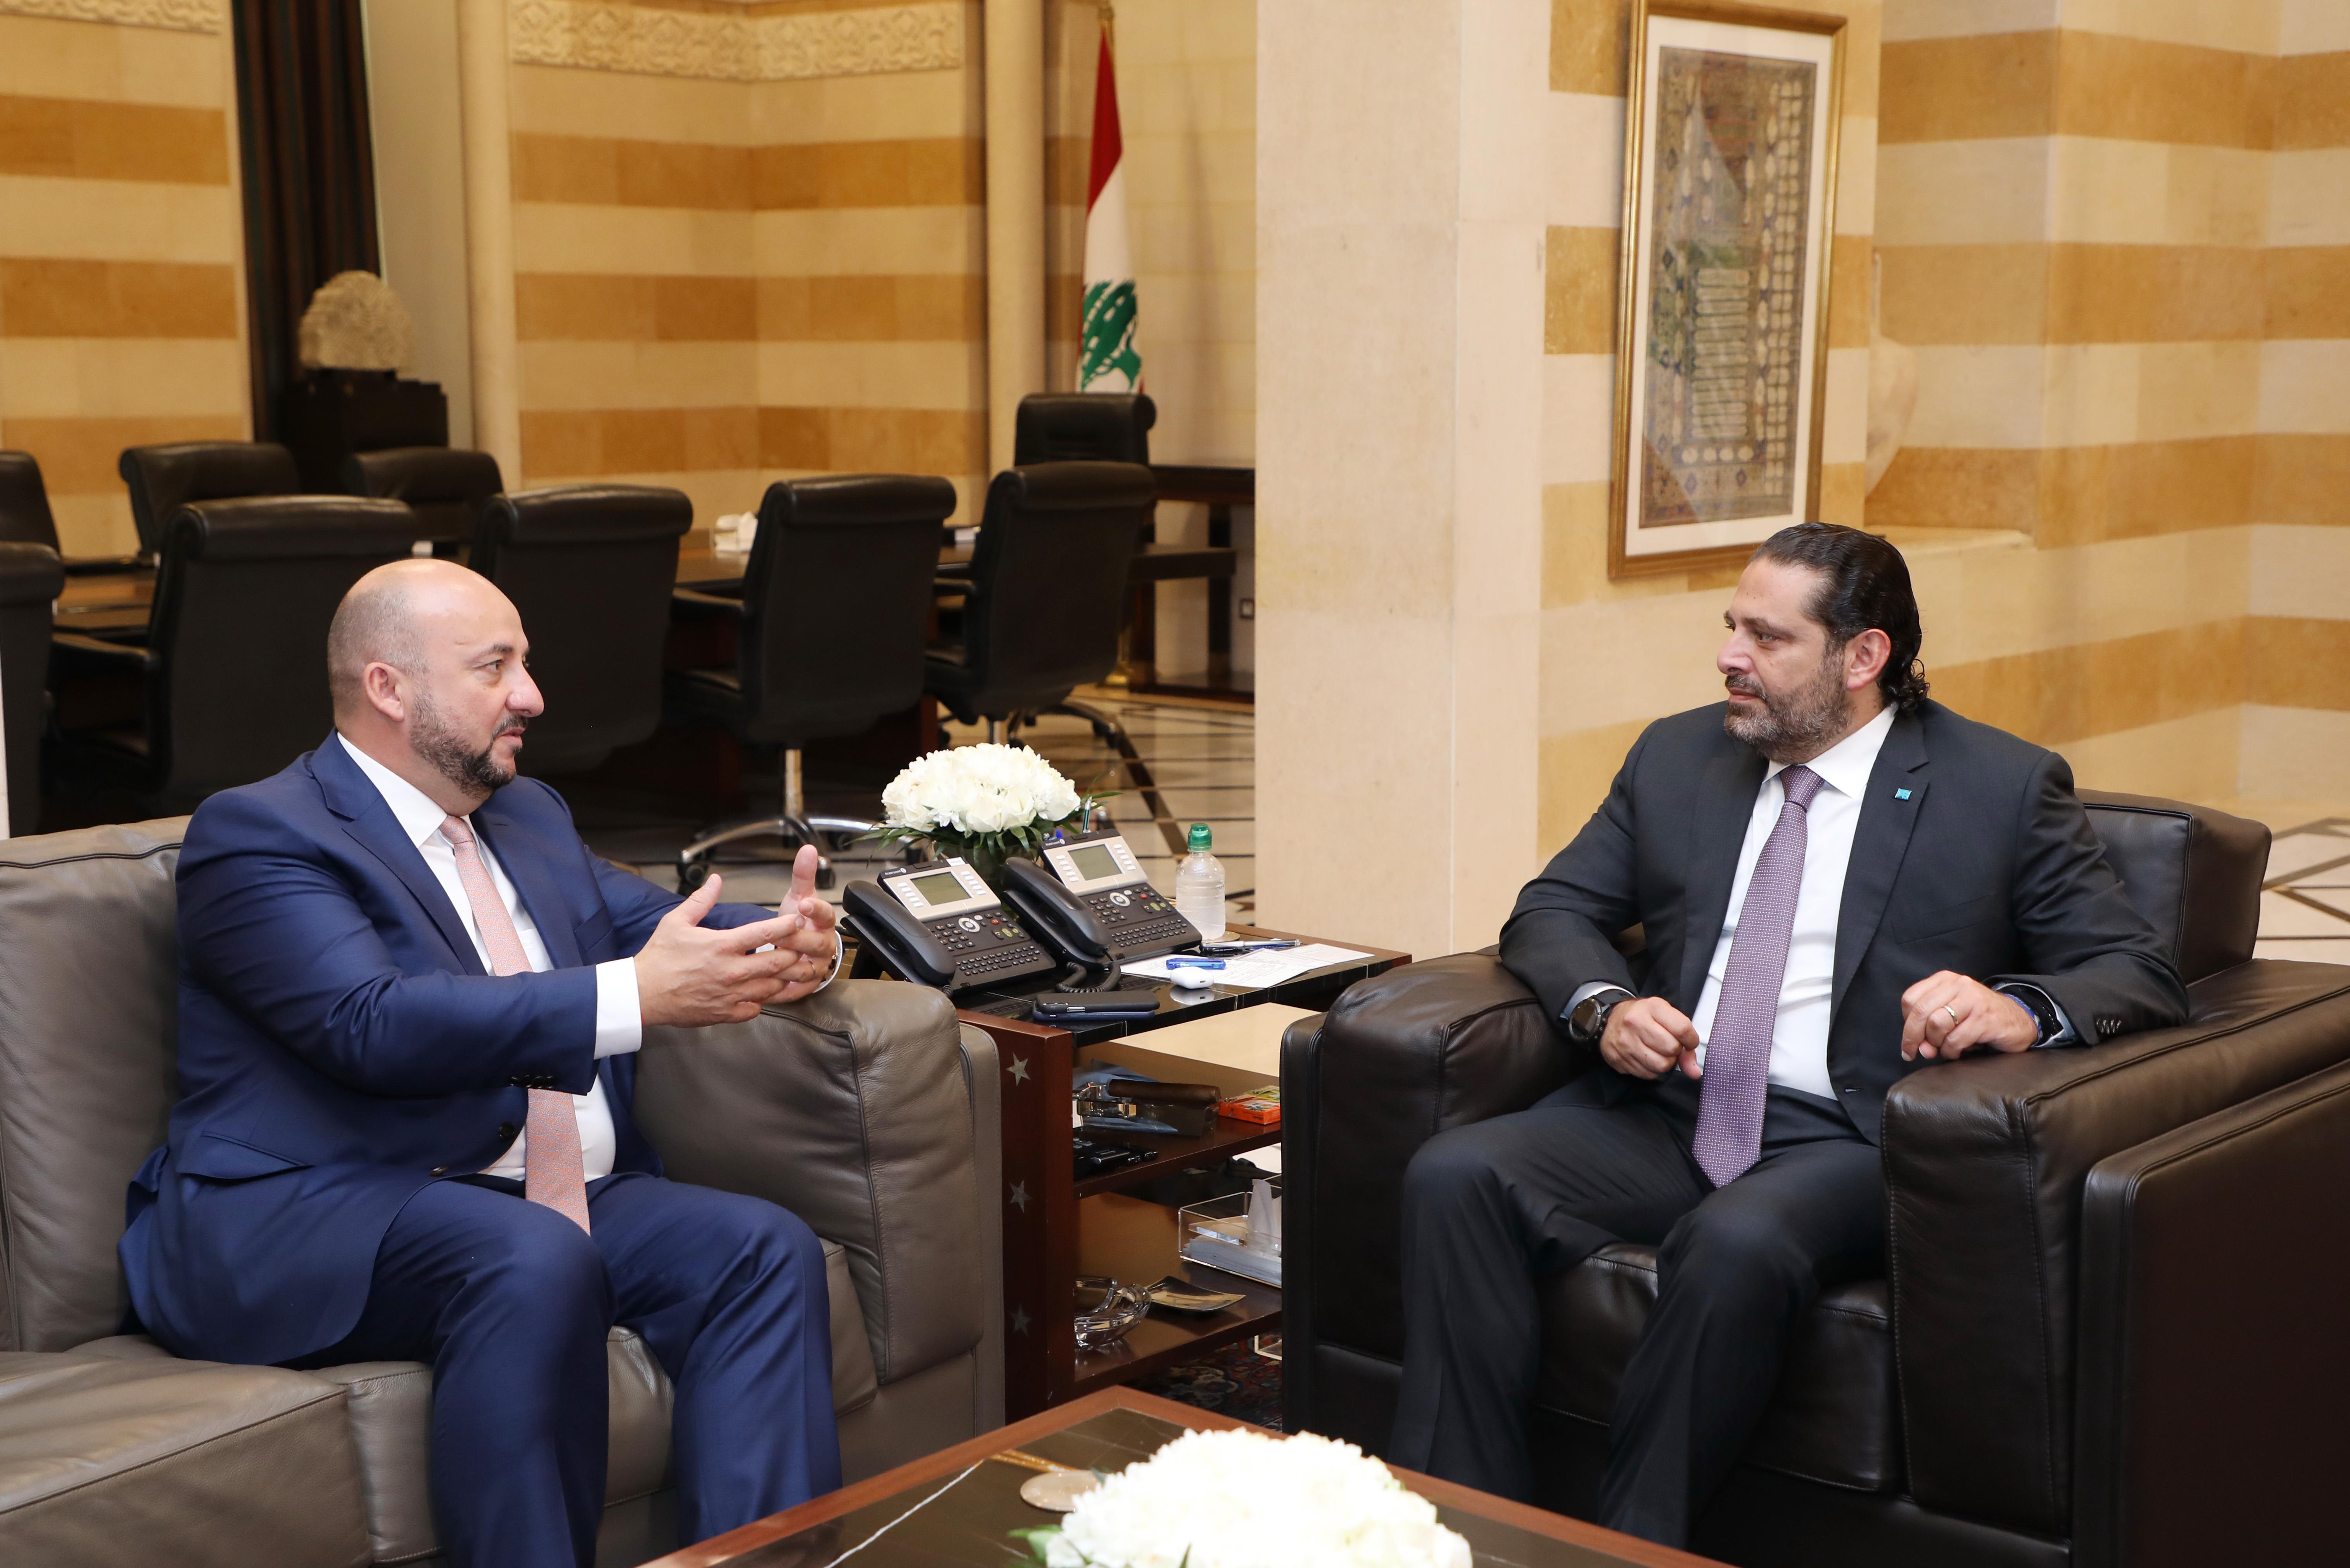 Pr Miinister Saad Hariri meets Luxenburg Deputy Pr Minister